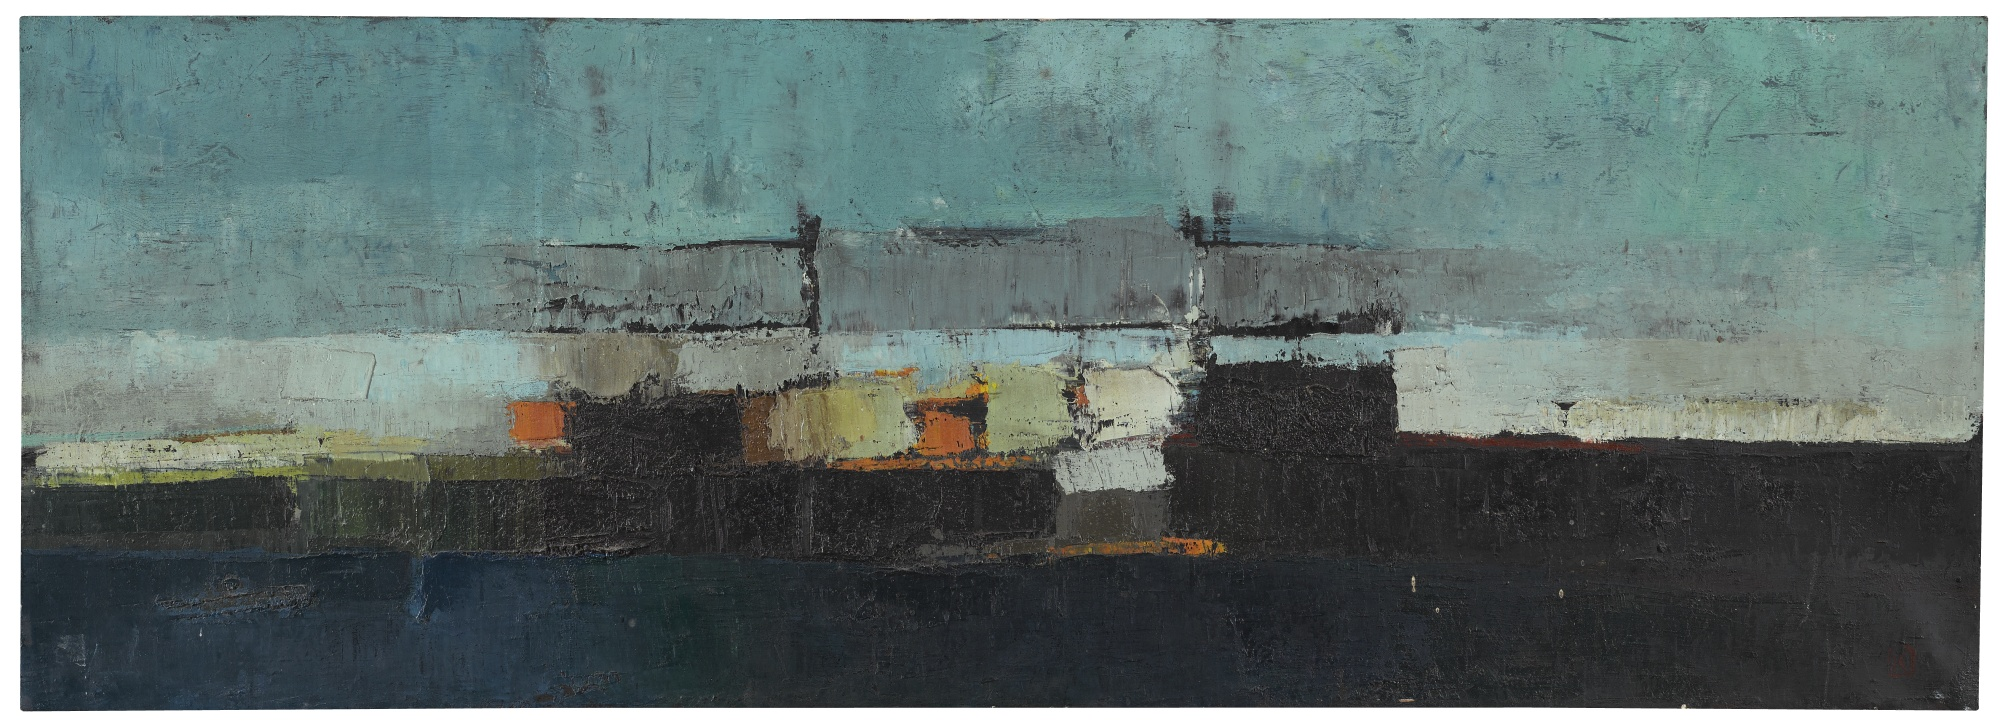 Peter Kinley-Seascape-1953